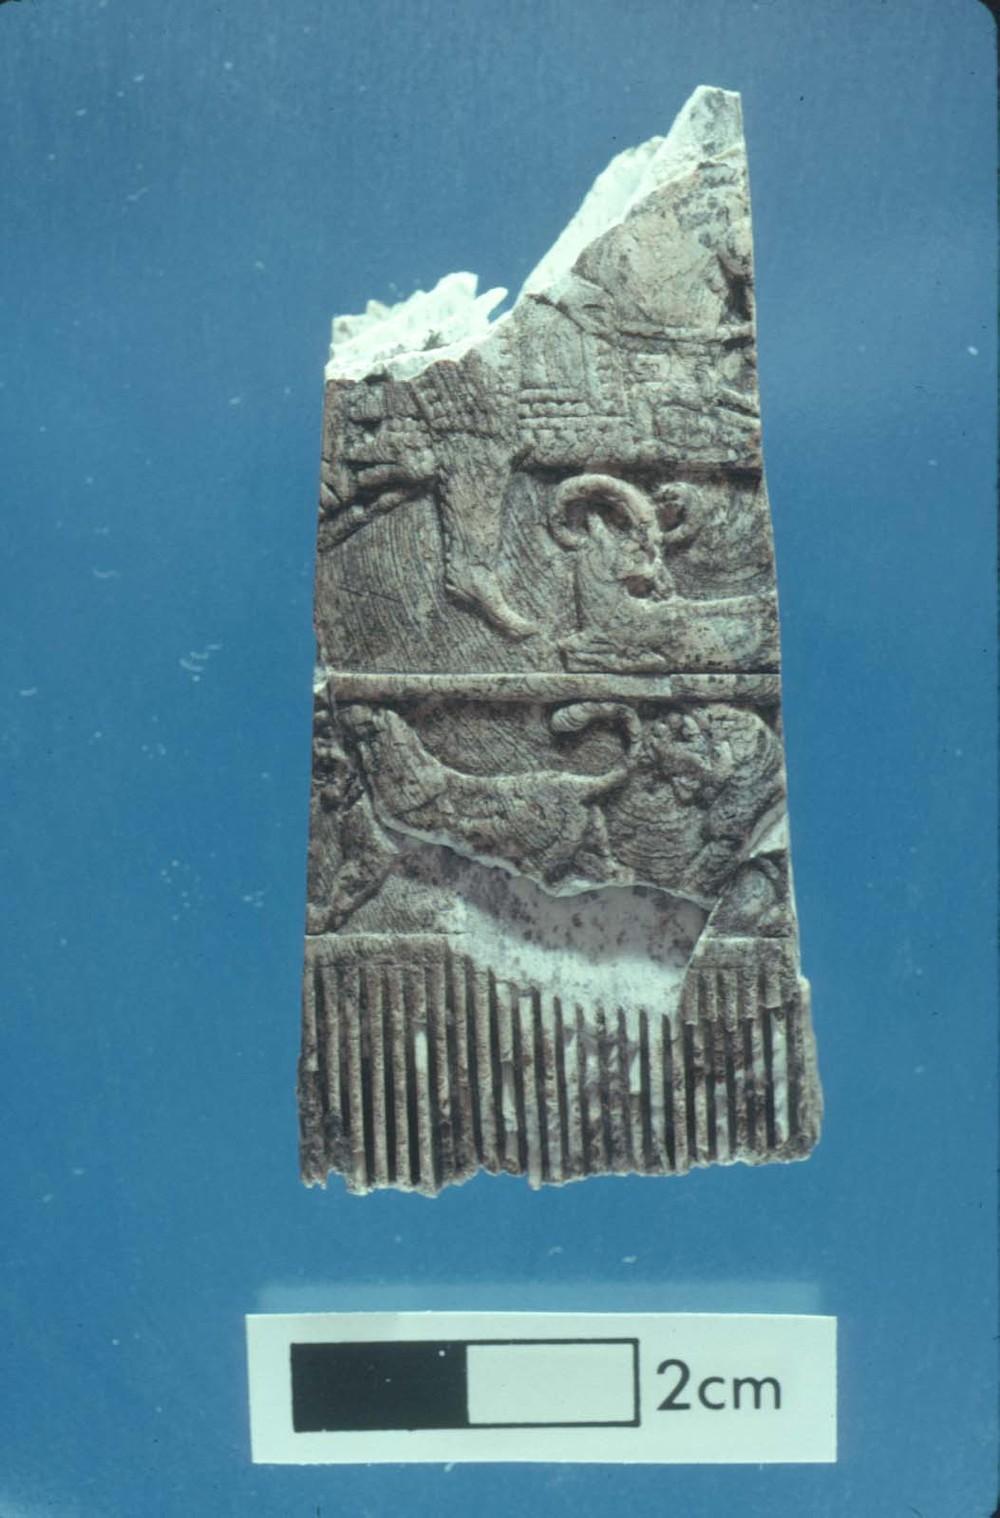 Ivory comb depicting a hunter on horseback.